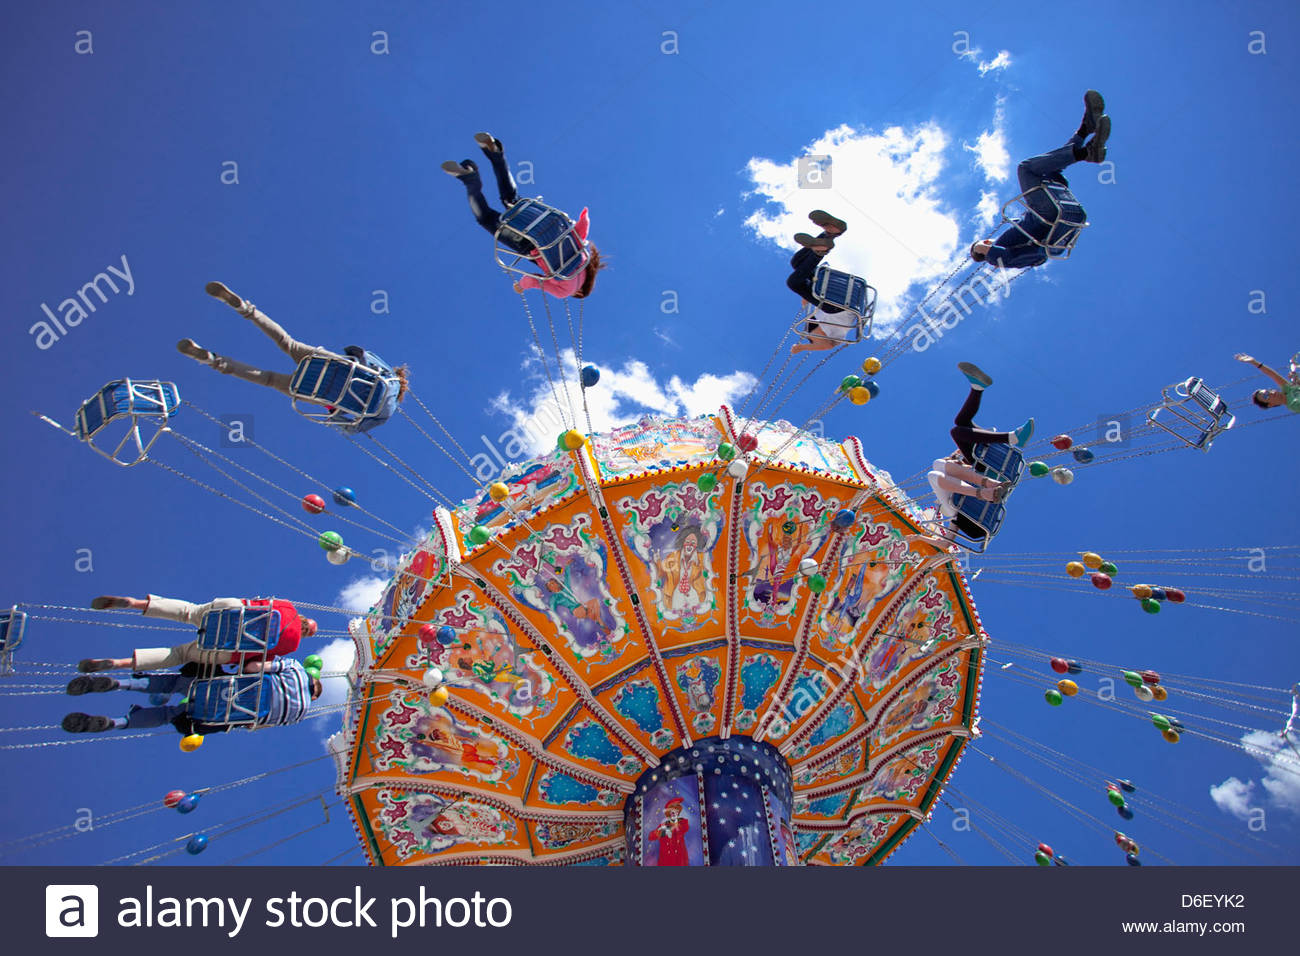 Carrusel de Oktoberfest Merry go round Munich Alemania Imagen De Stock